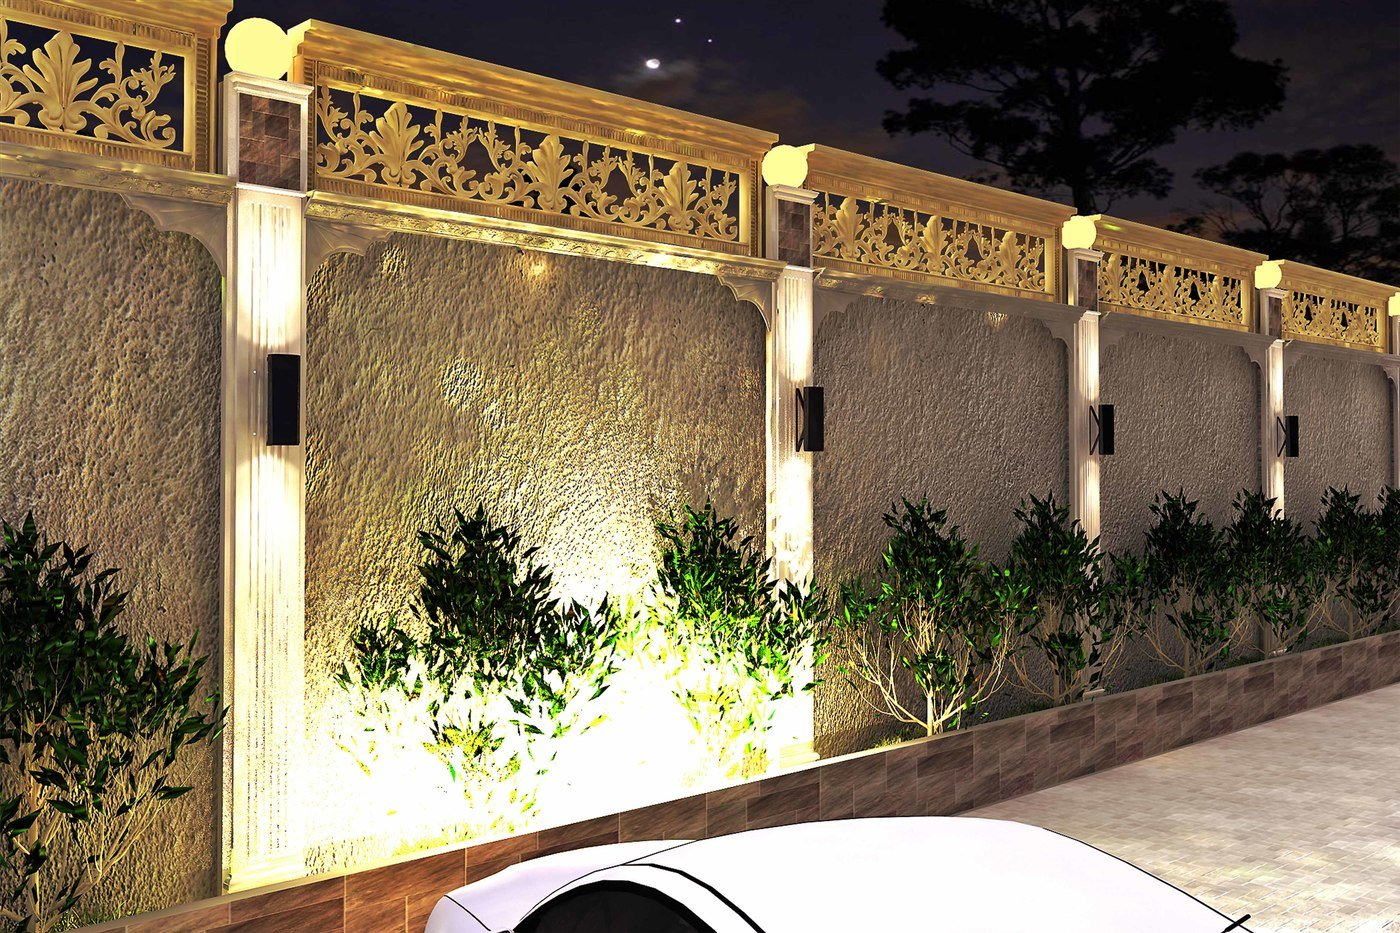 Boundary Wall Design By Israr Ahmed At Coroflotcom